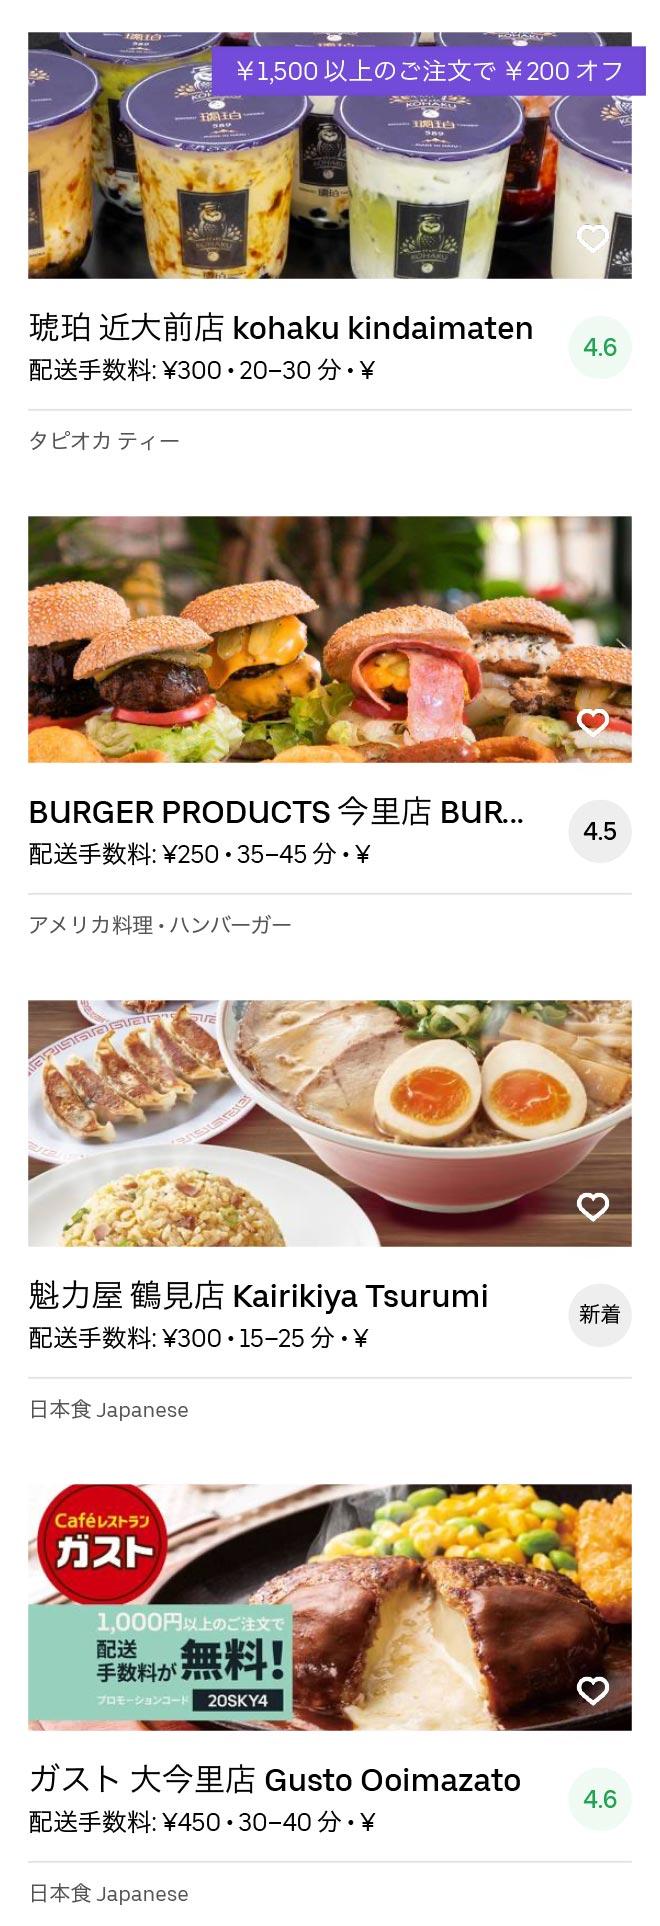 Higashi osaka nagata menu 2005 03